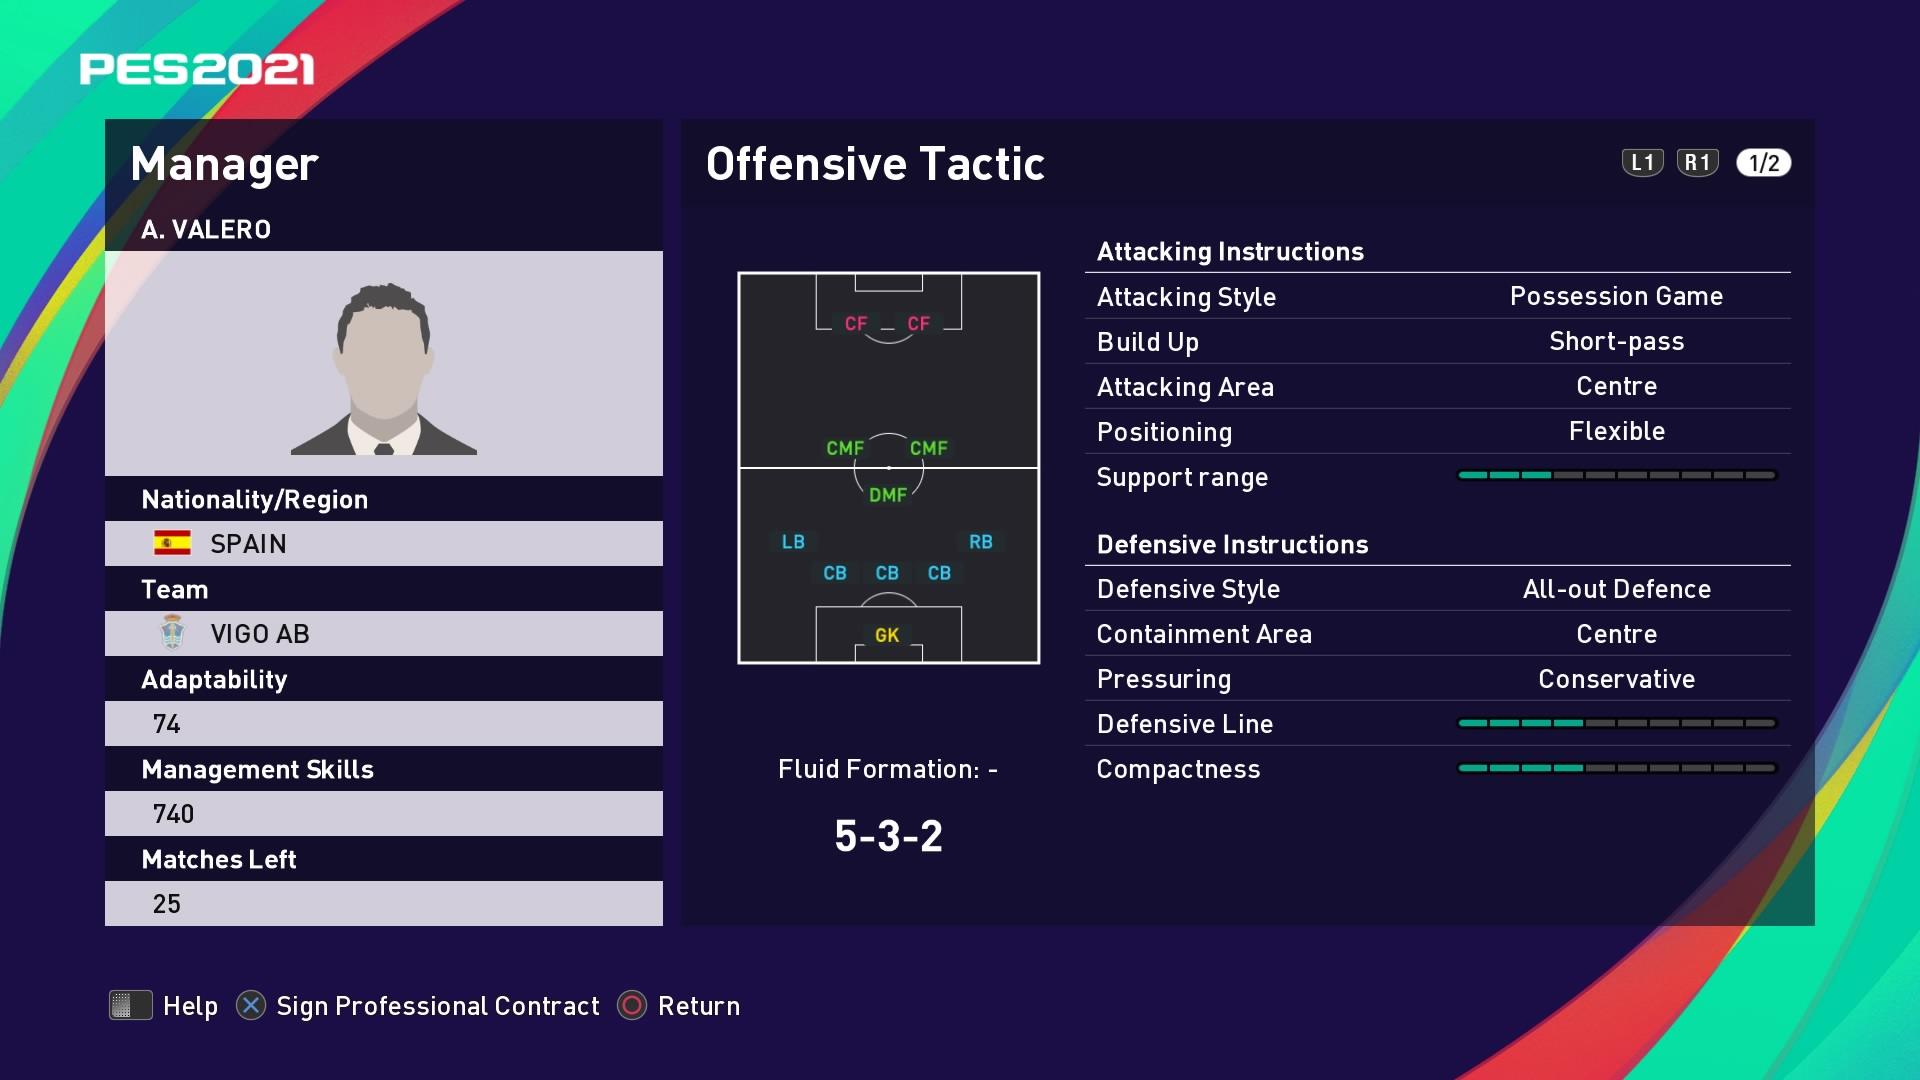 A. Valero (Óscar Garcia) Offensive Tactic in PES 2021 myClub